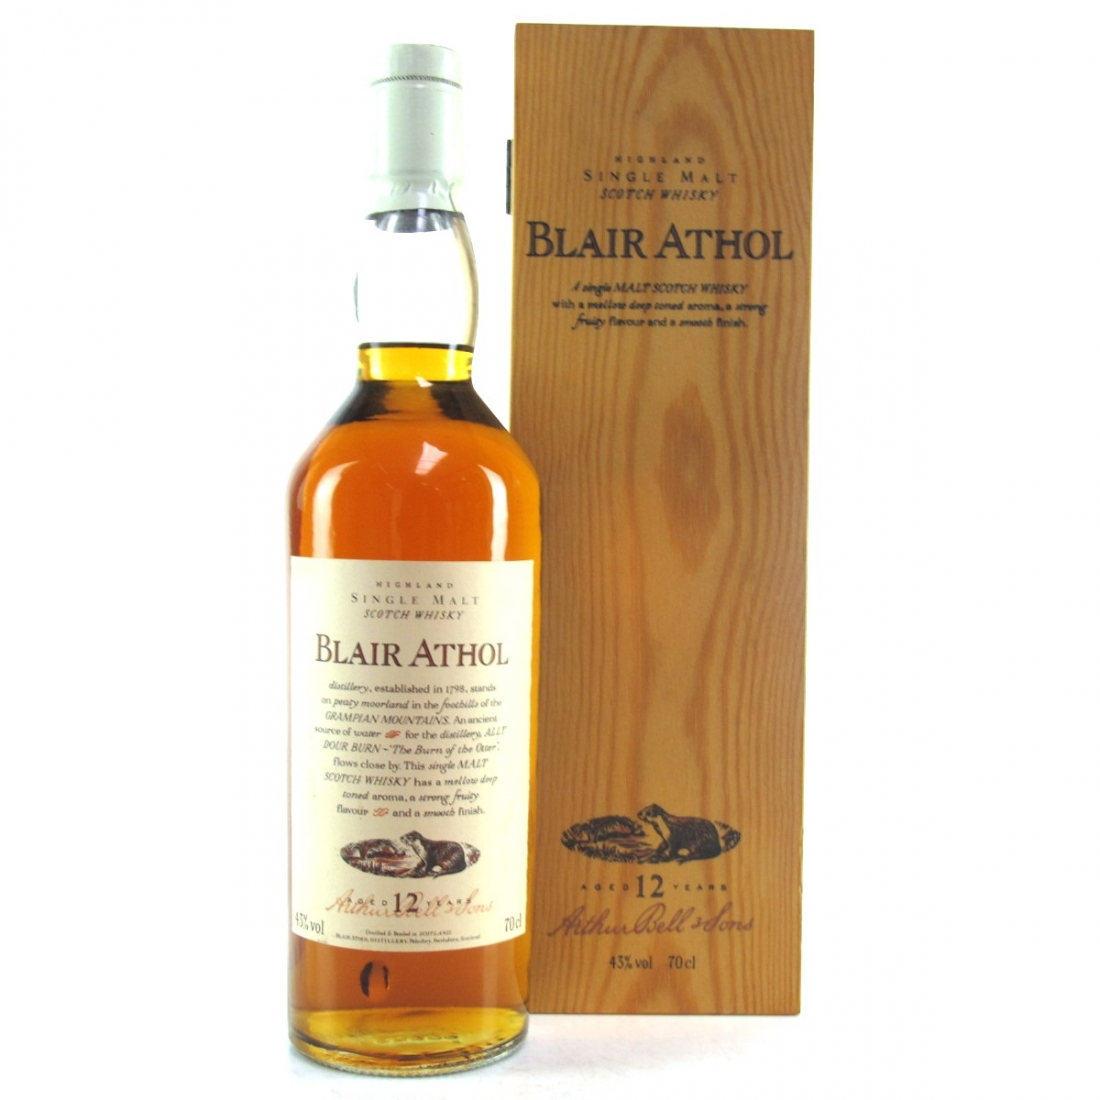 Blair Athol 12 Year Old Flora and Fauna / Wooden Box White Cap